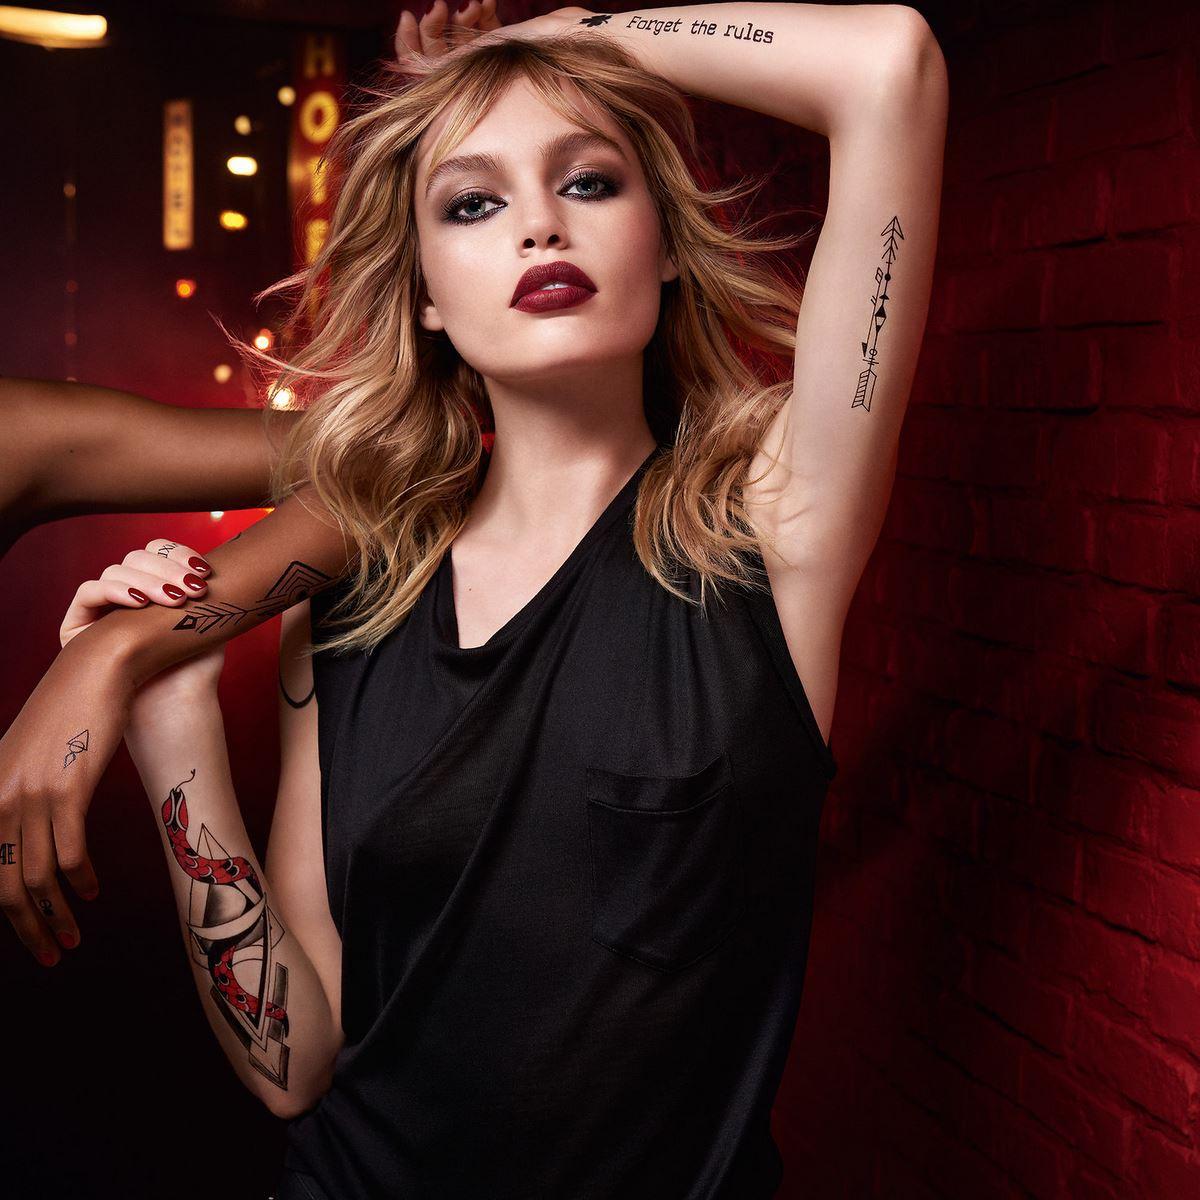 Осенняя коллекция матовых блесков для губ Yves Saint Laurent Tatouage Couture Matte Stain Fall